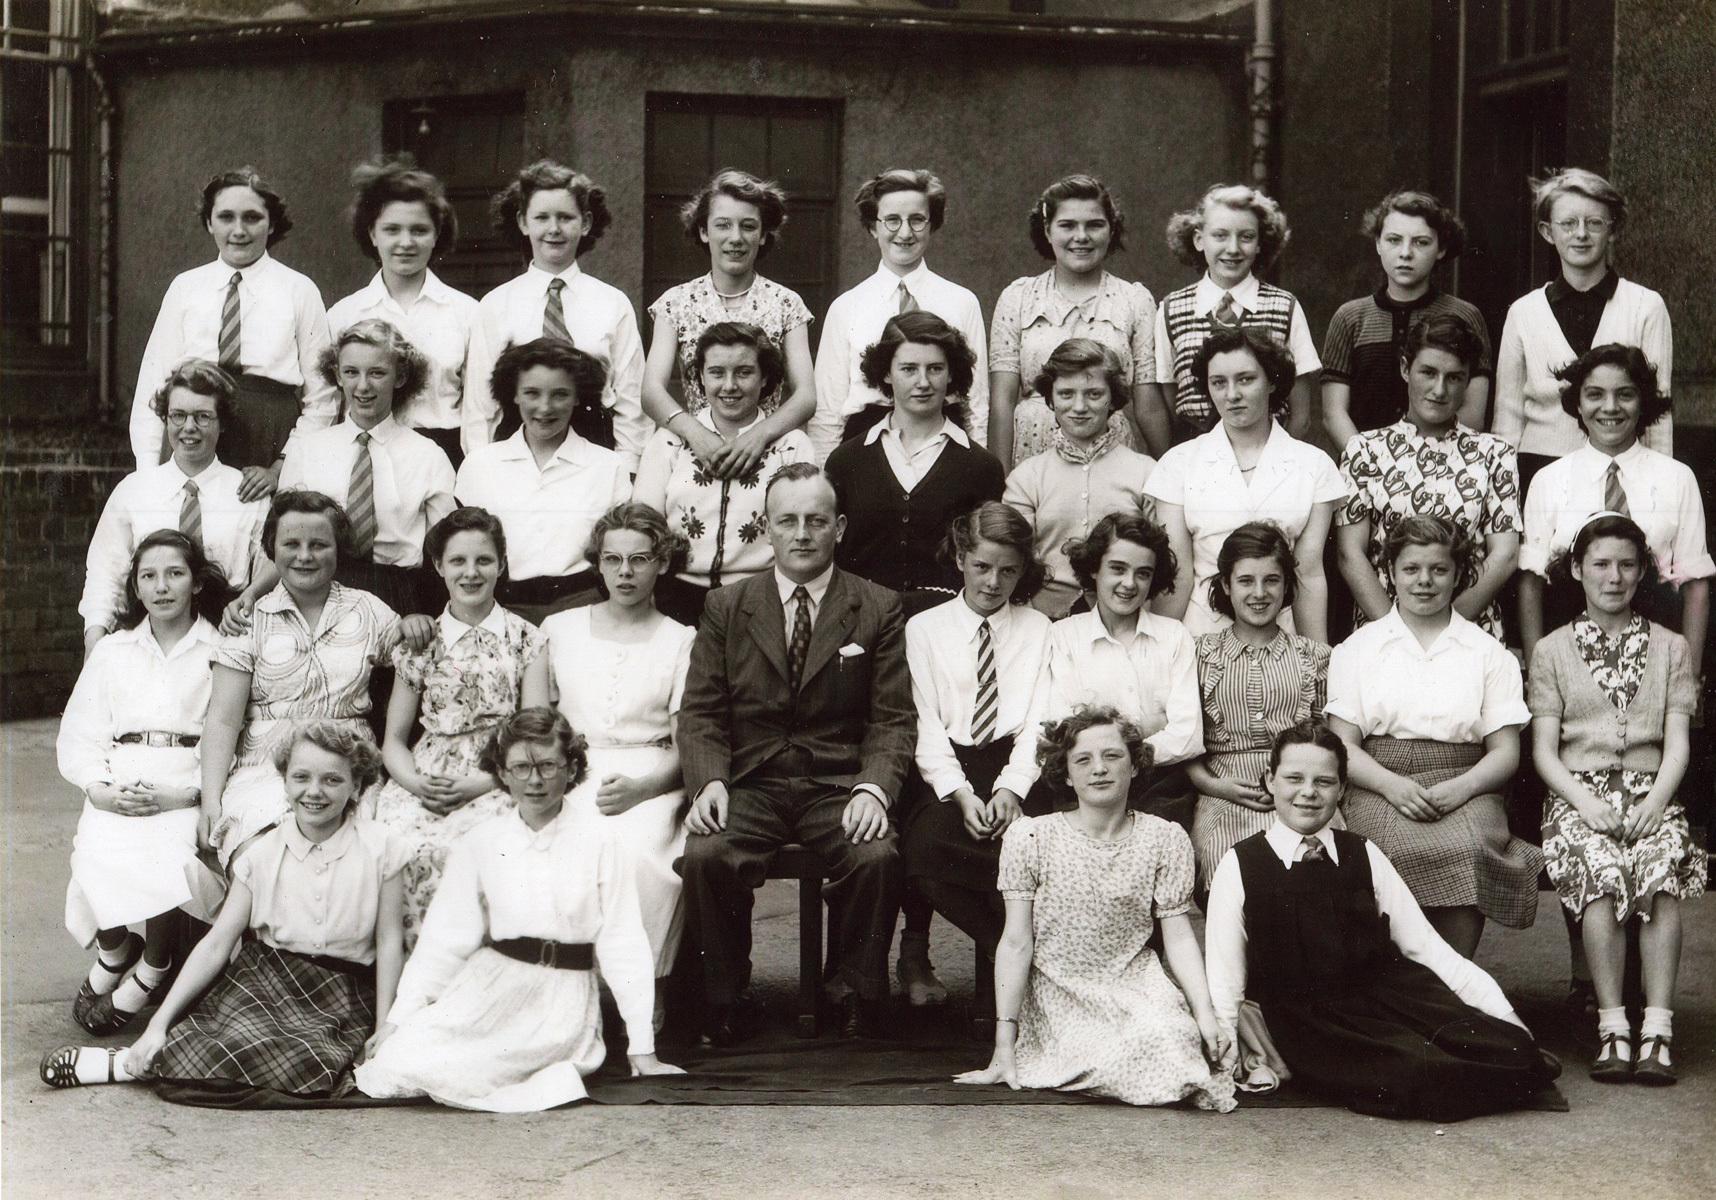 Tynecastle School Class Portrait, June 1953